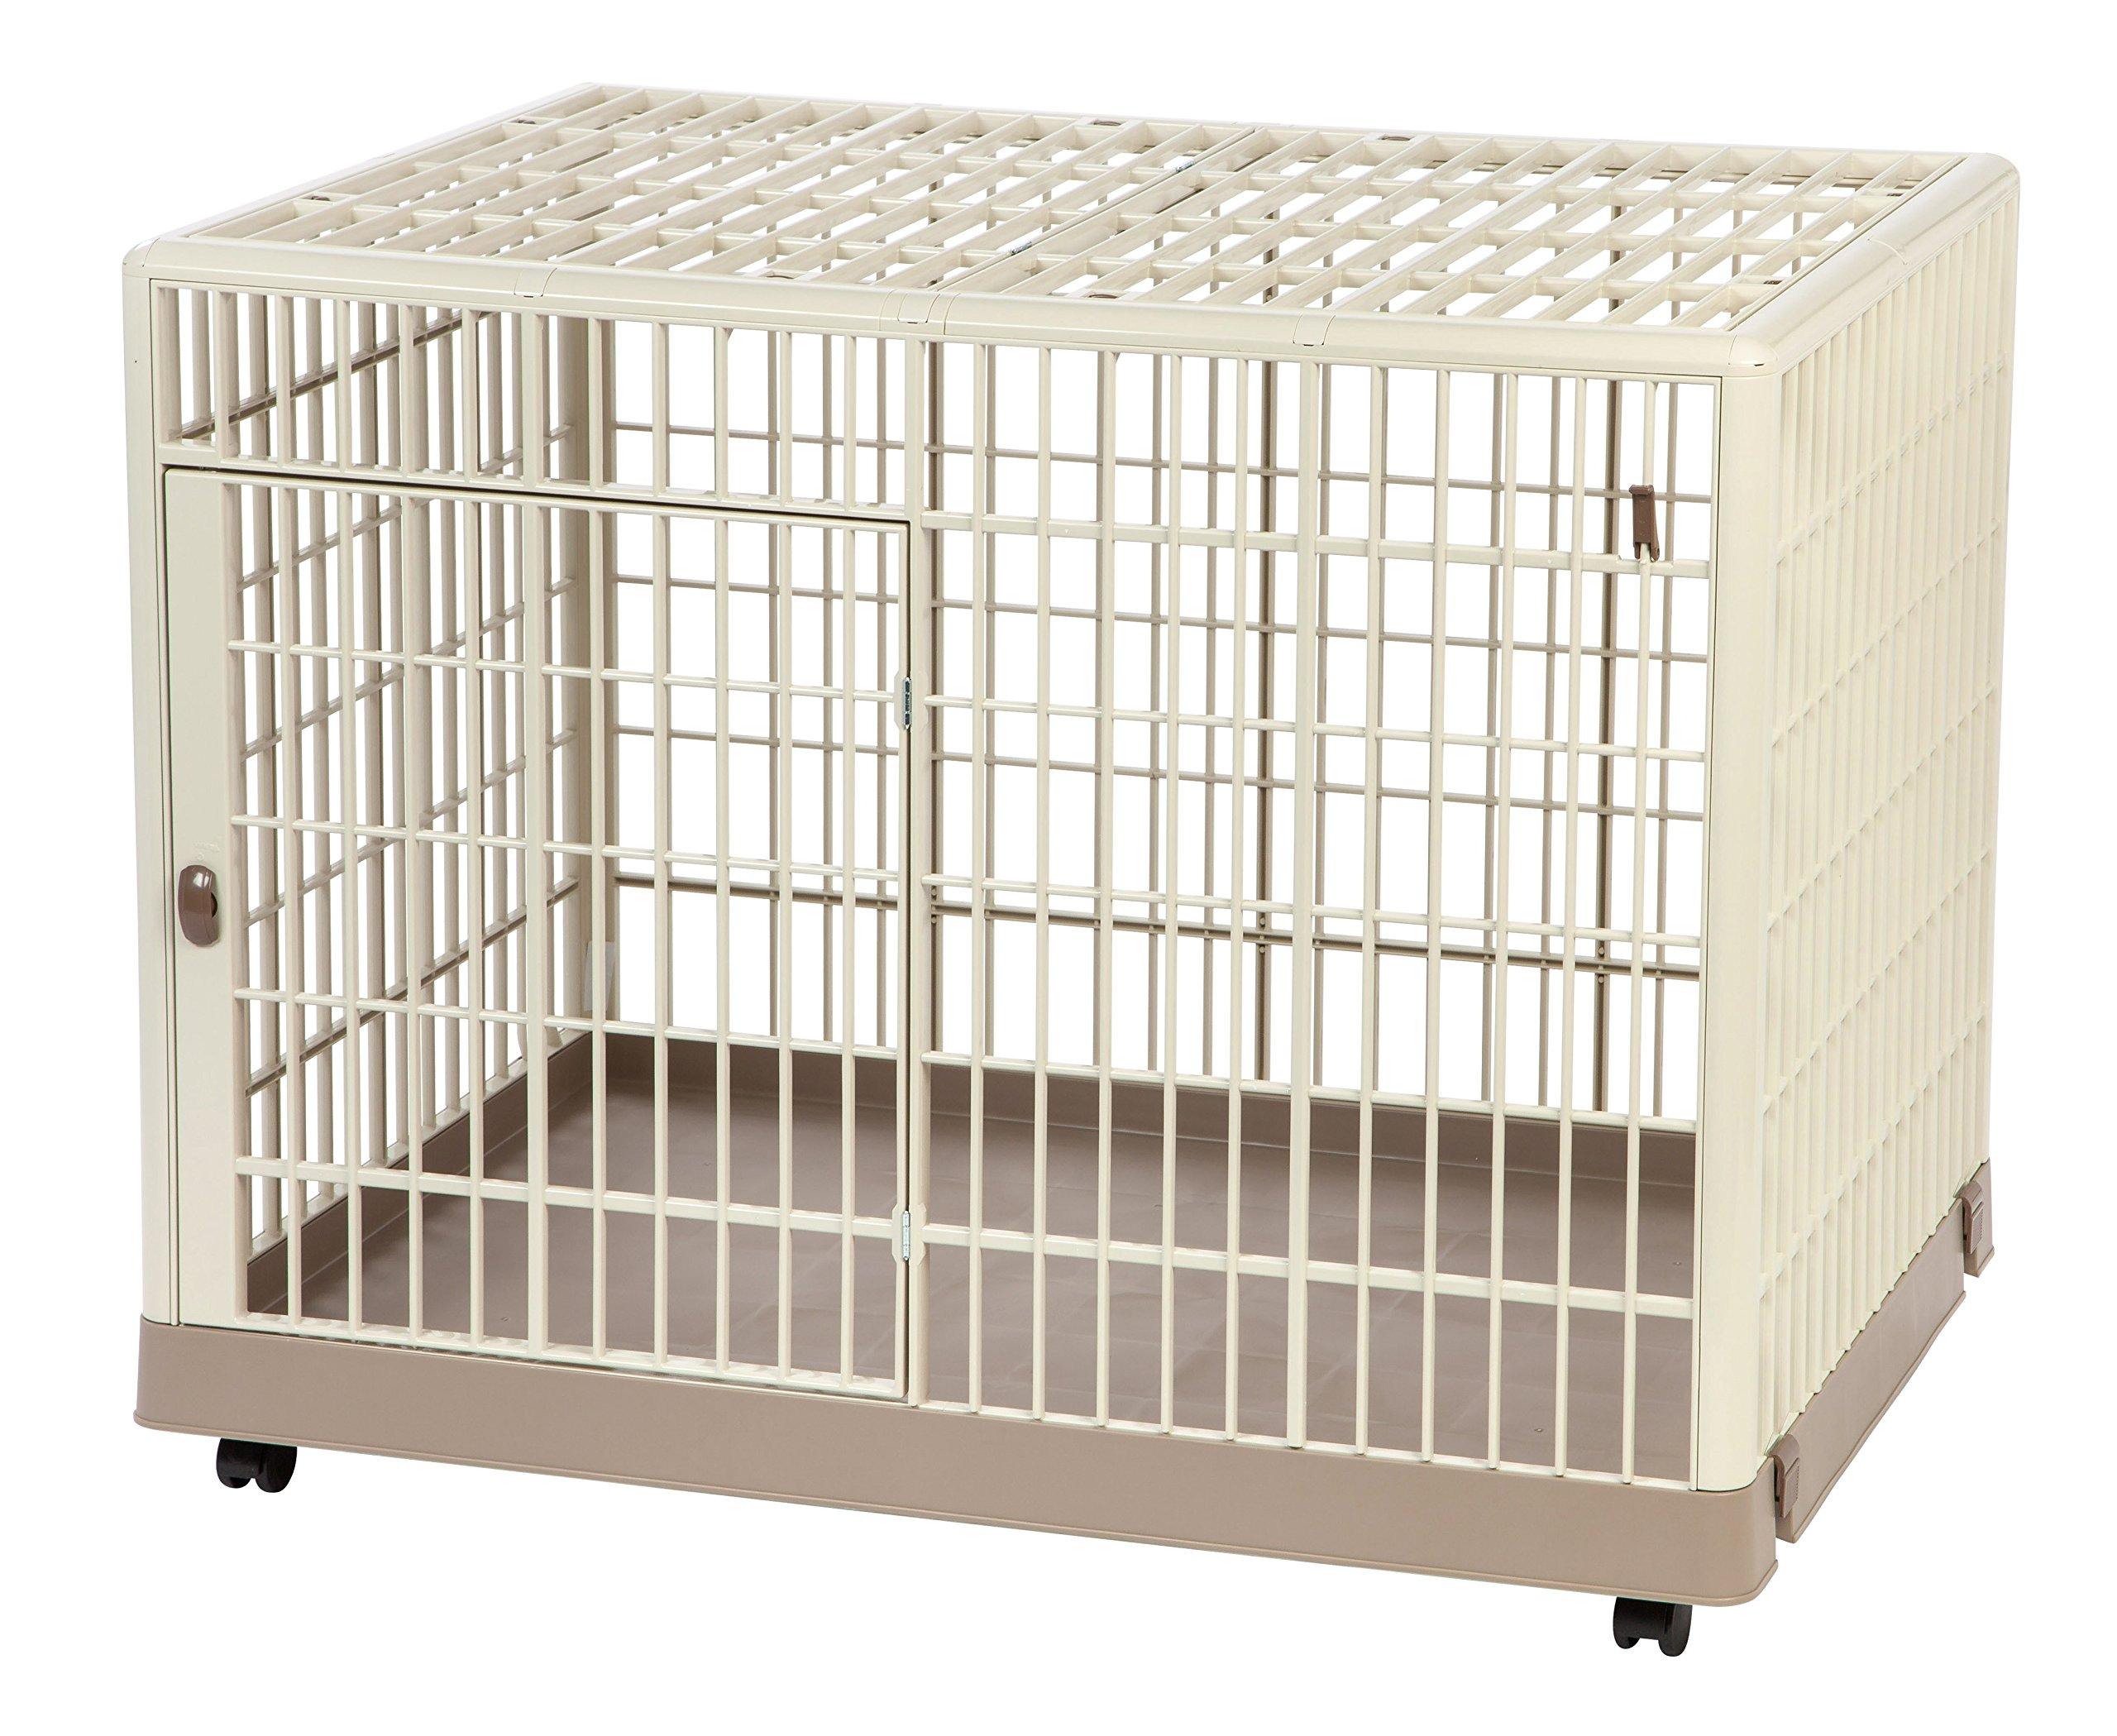 IRIS Plastic Animal Cage, Beige, Small